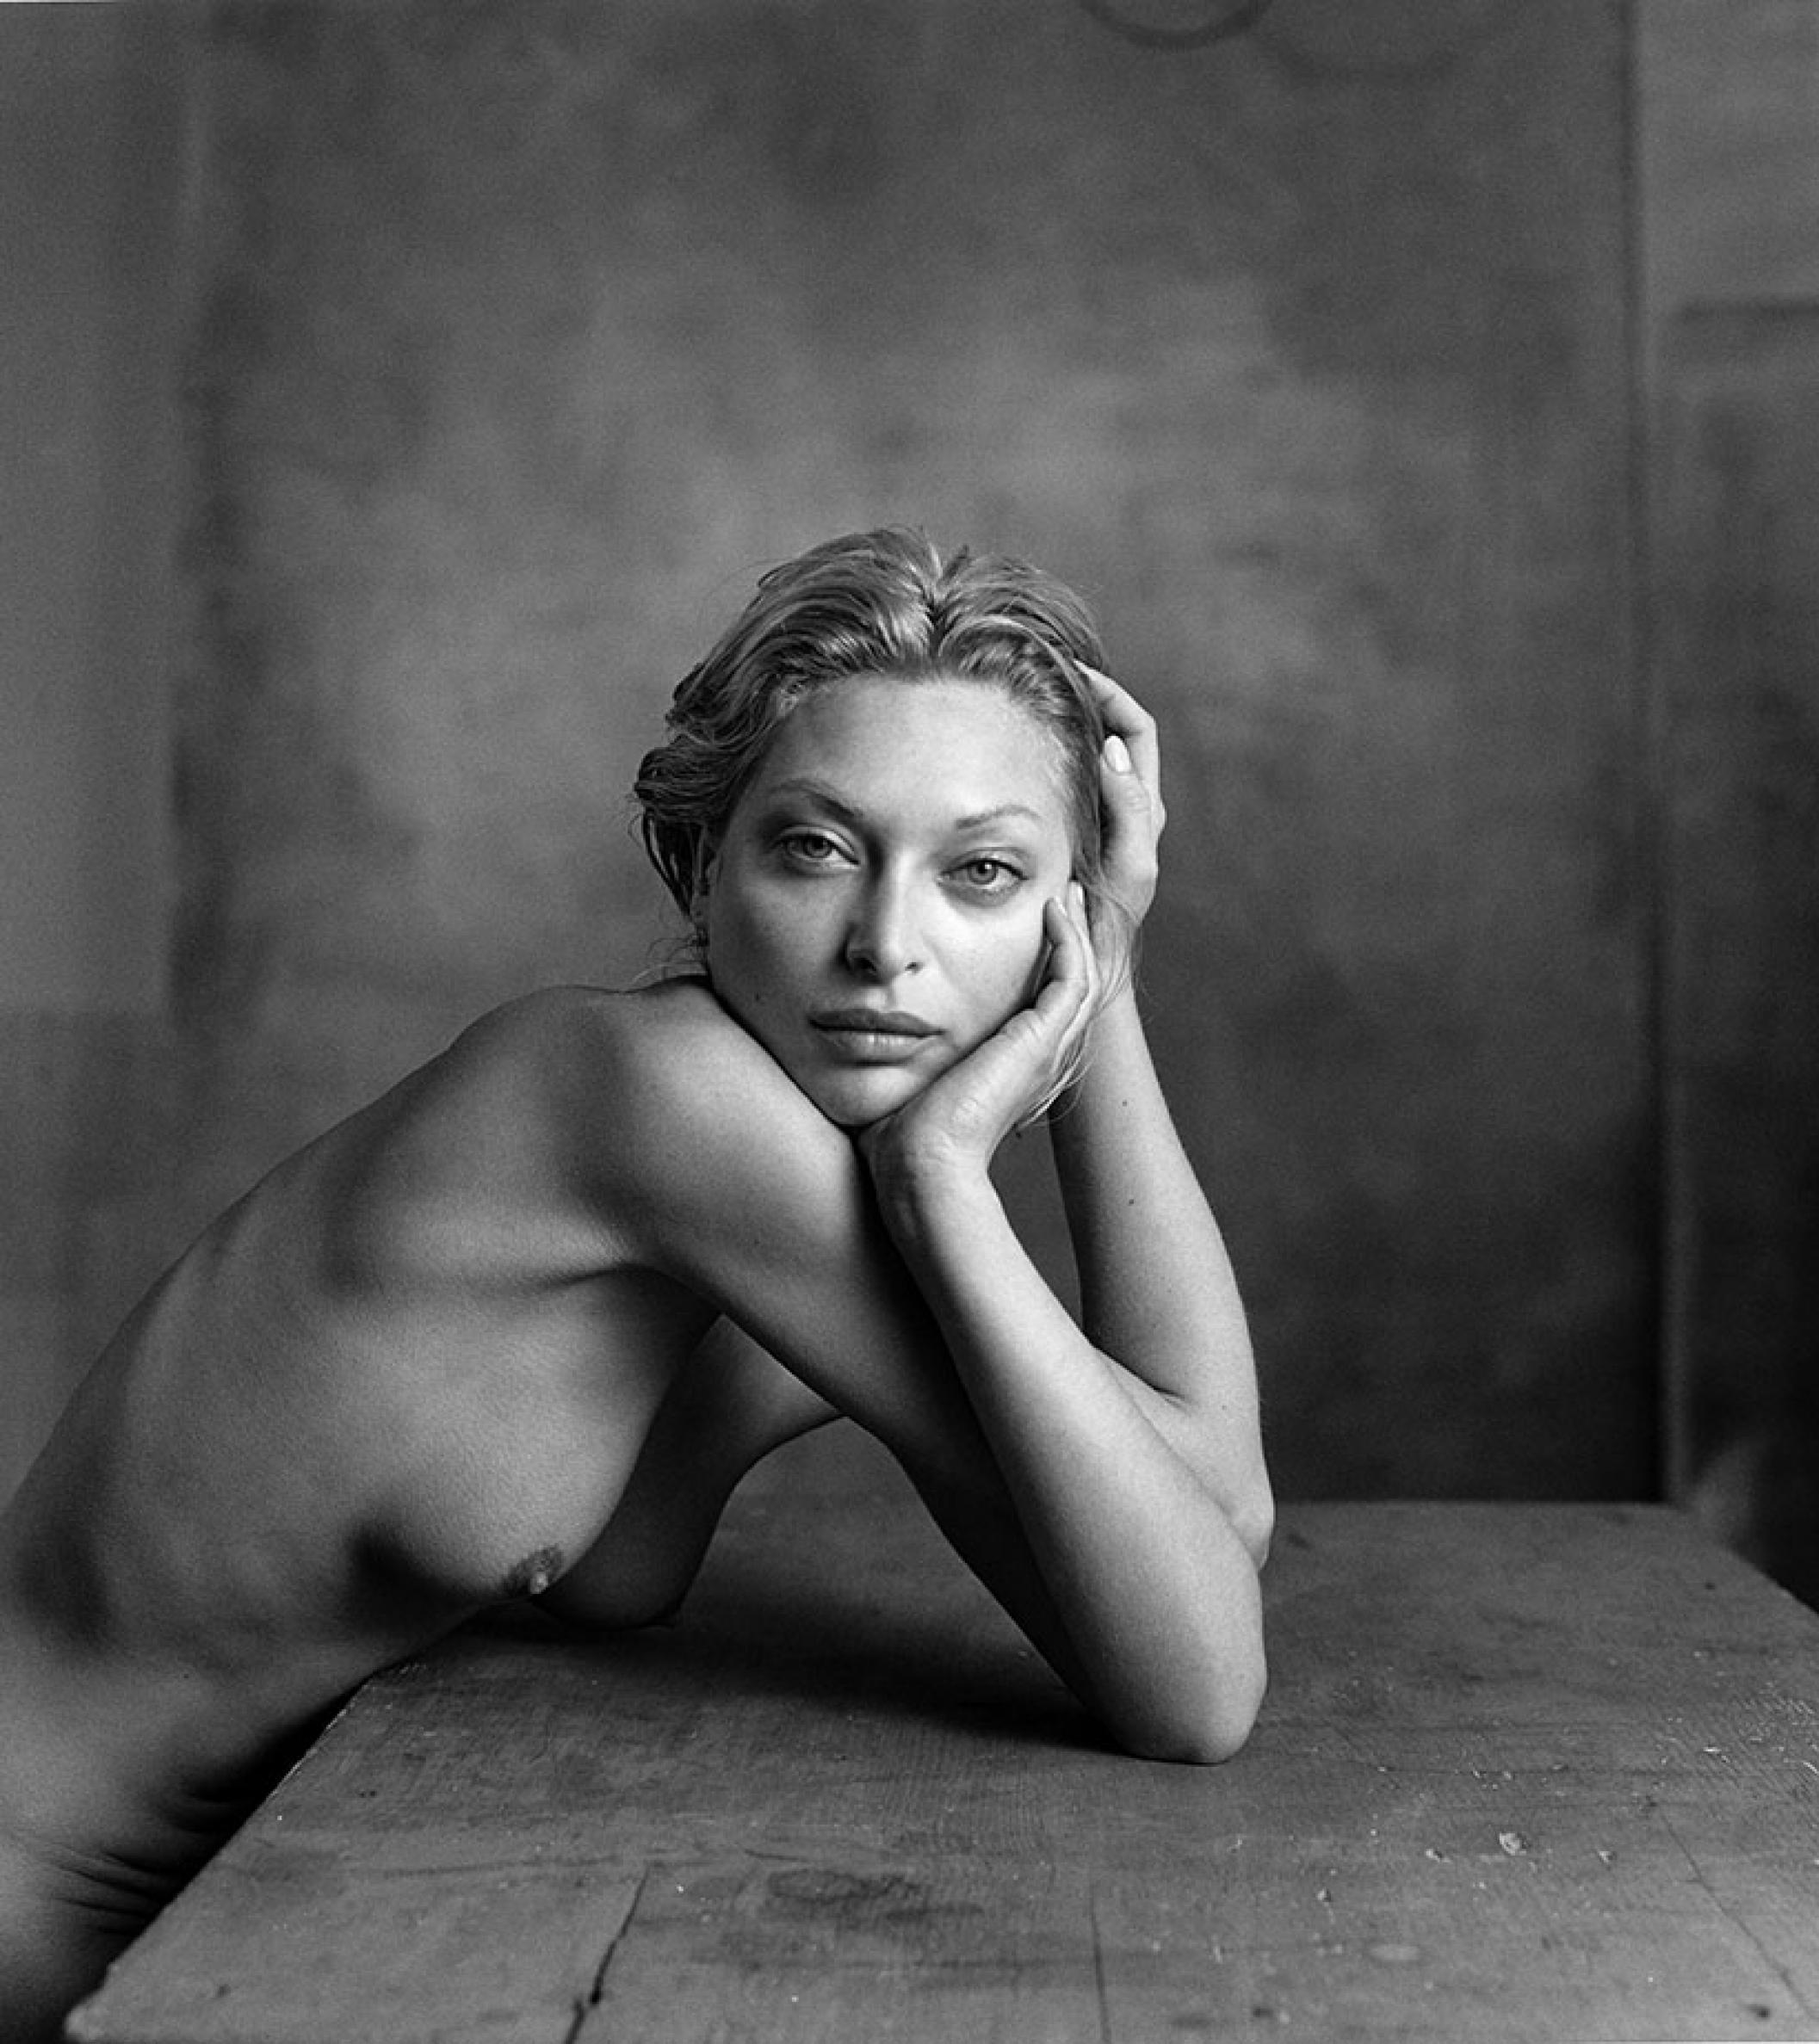 free photo model photography portrait pose woman free